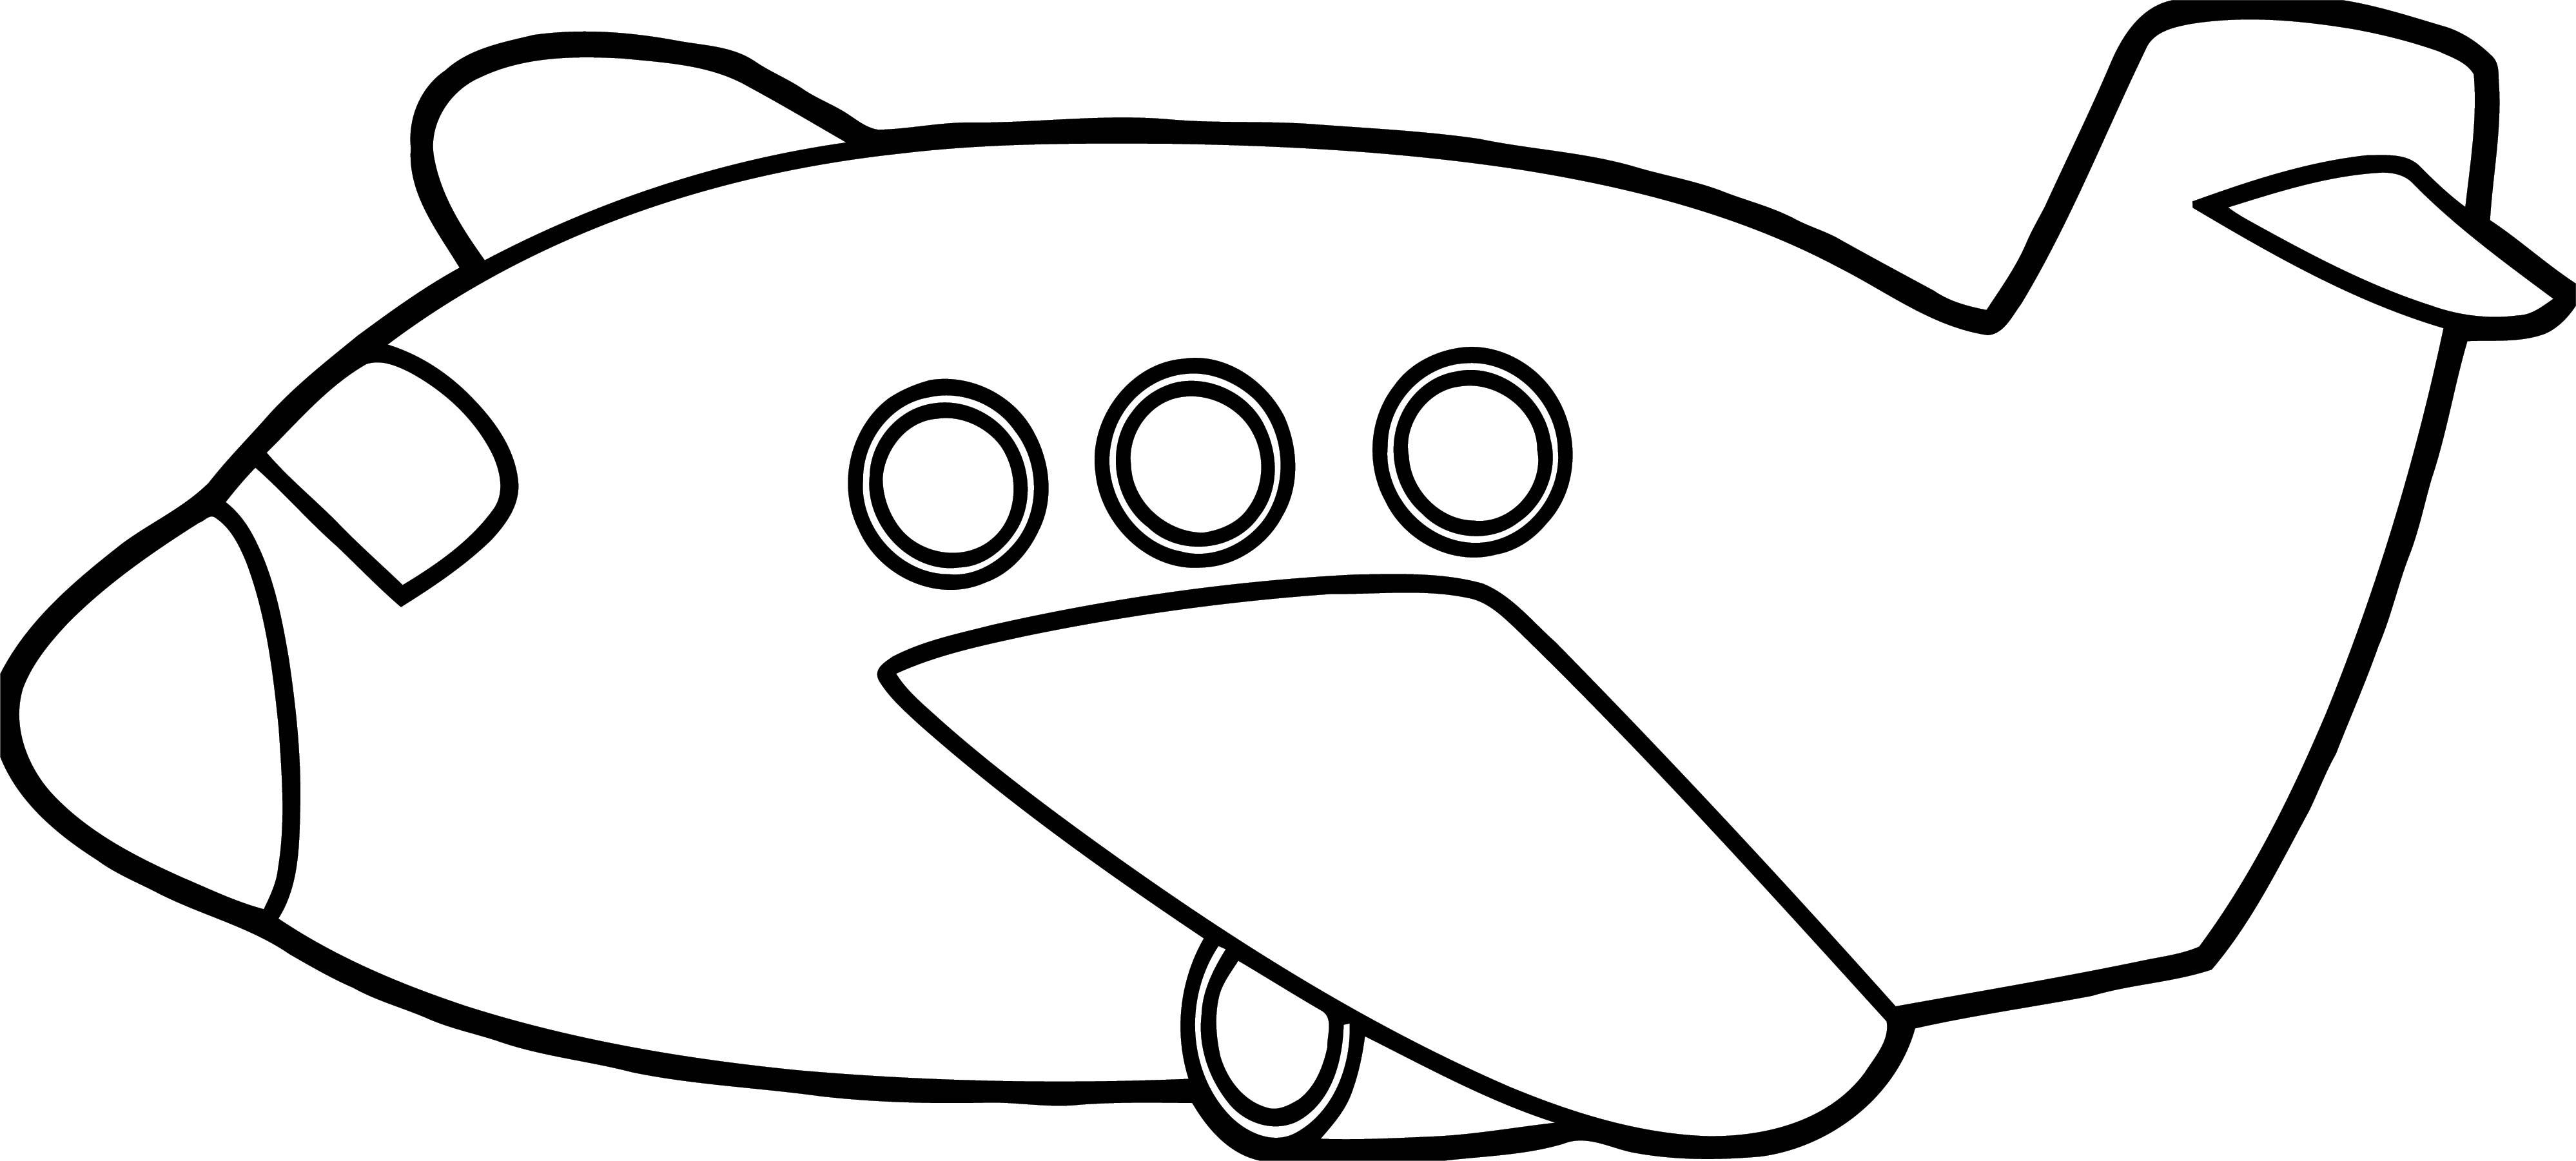 plane we coloring page 15 wecoloringpage com